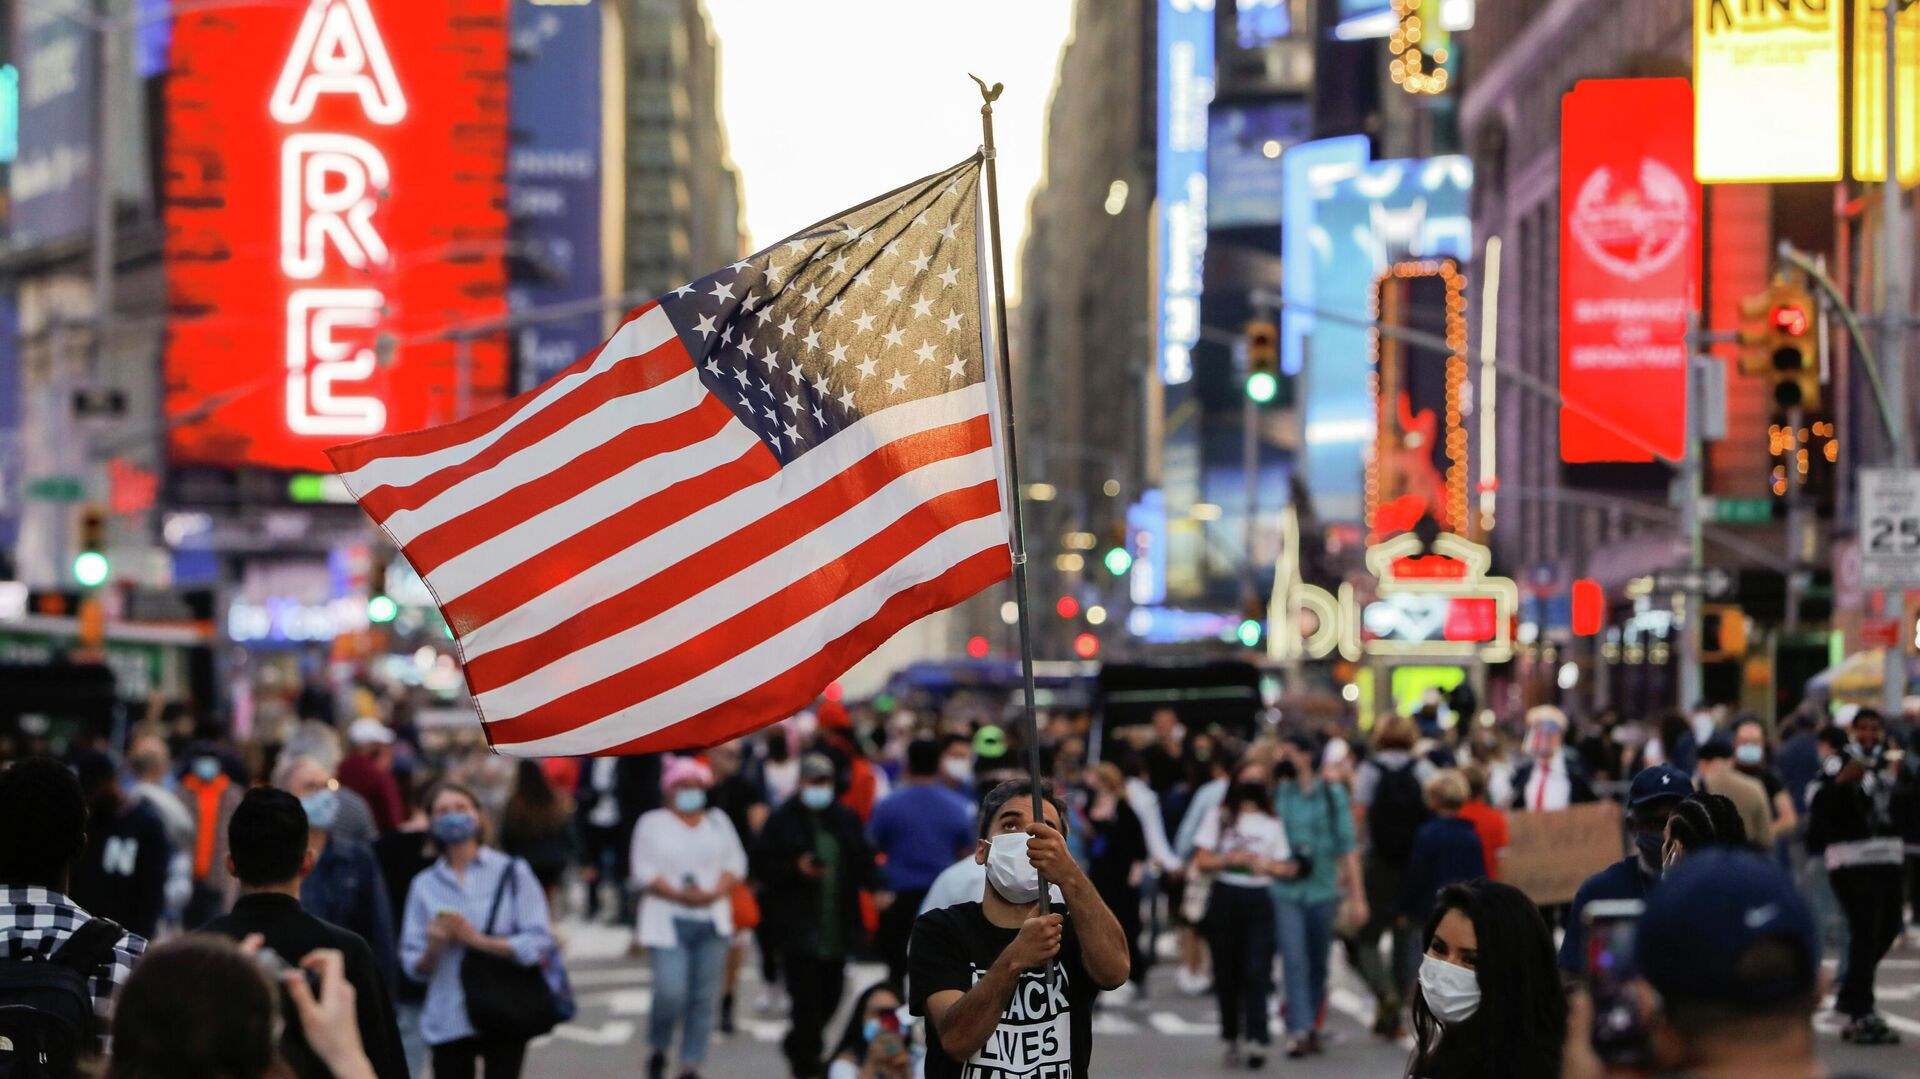 Мужчина с флагом США на Таймс-сквер в Нью-Йорке - РИА Новости, 1920, 01.12.2020